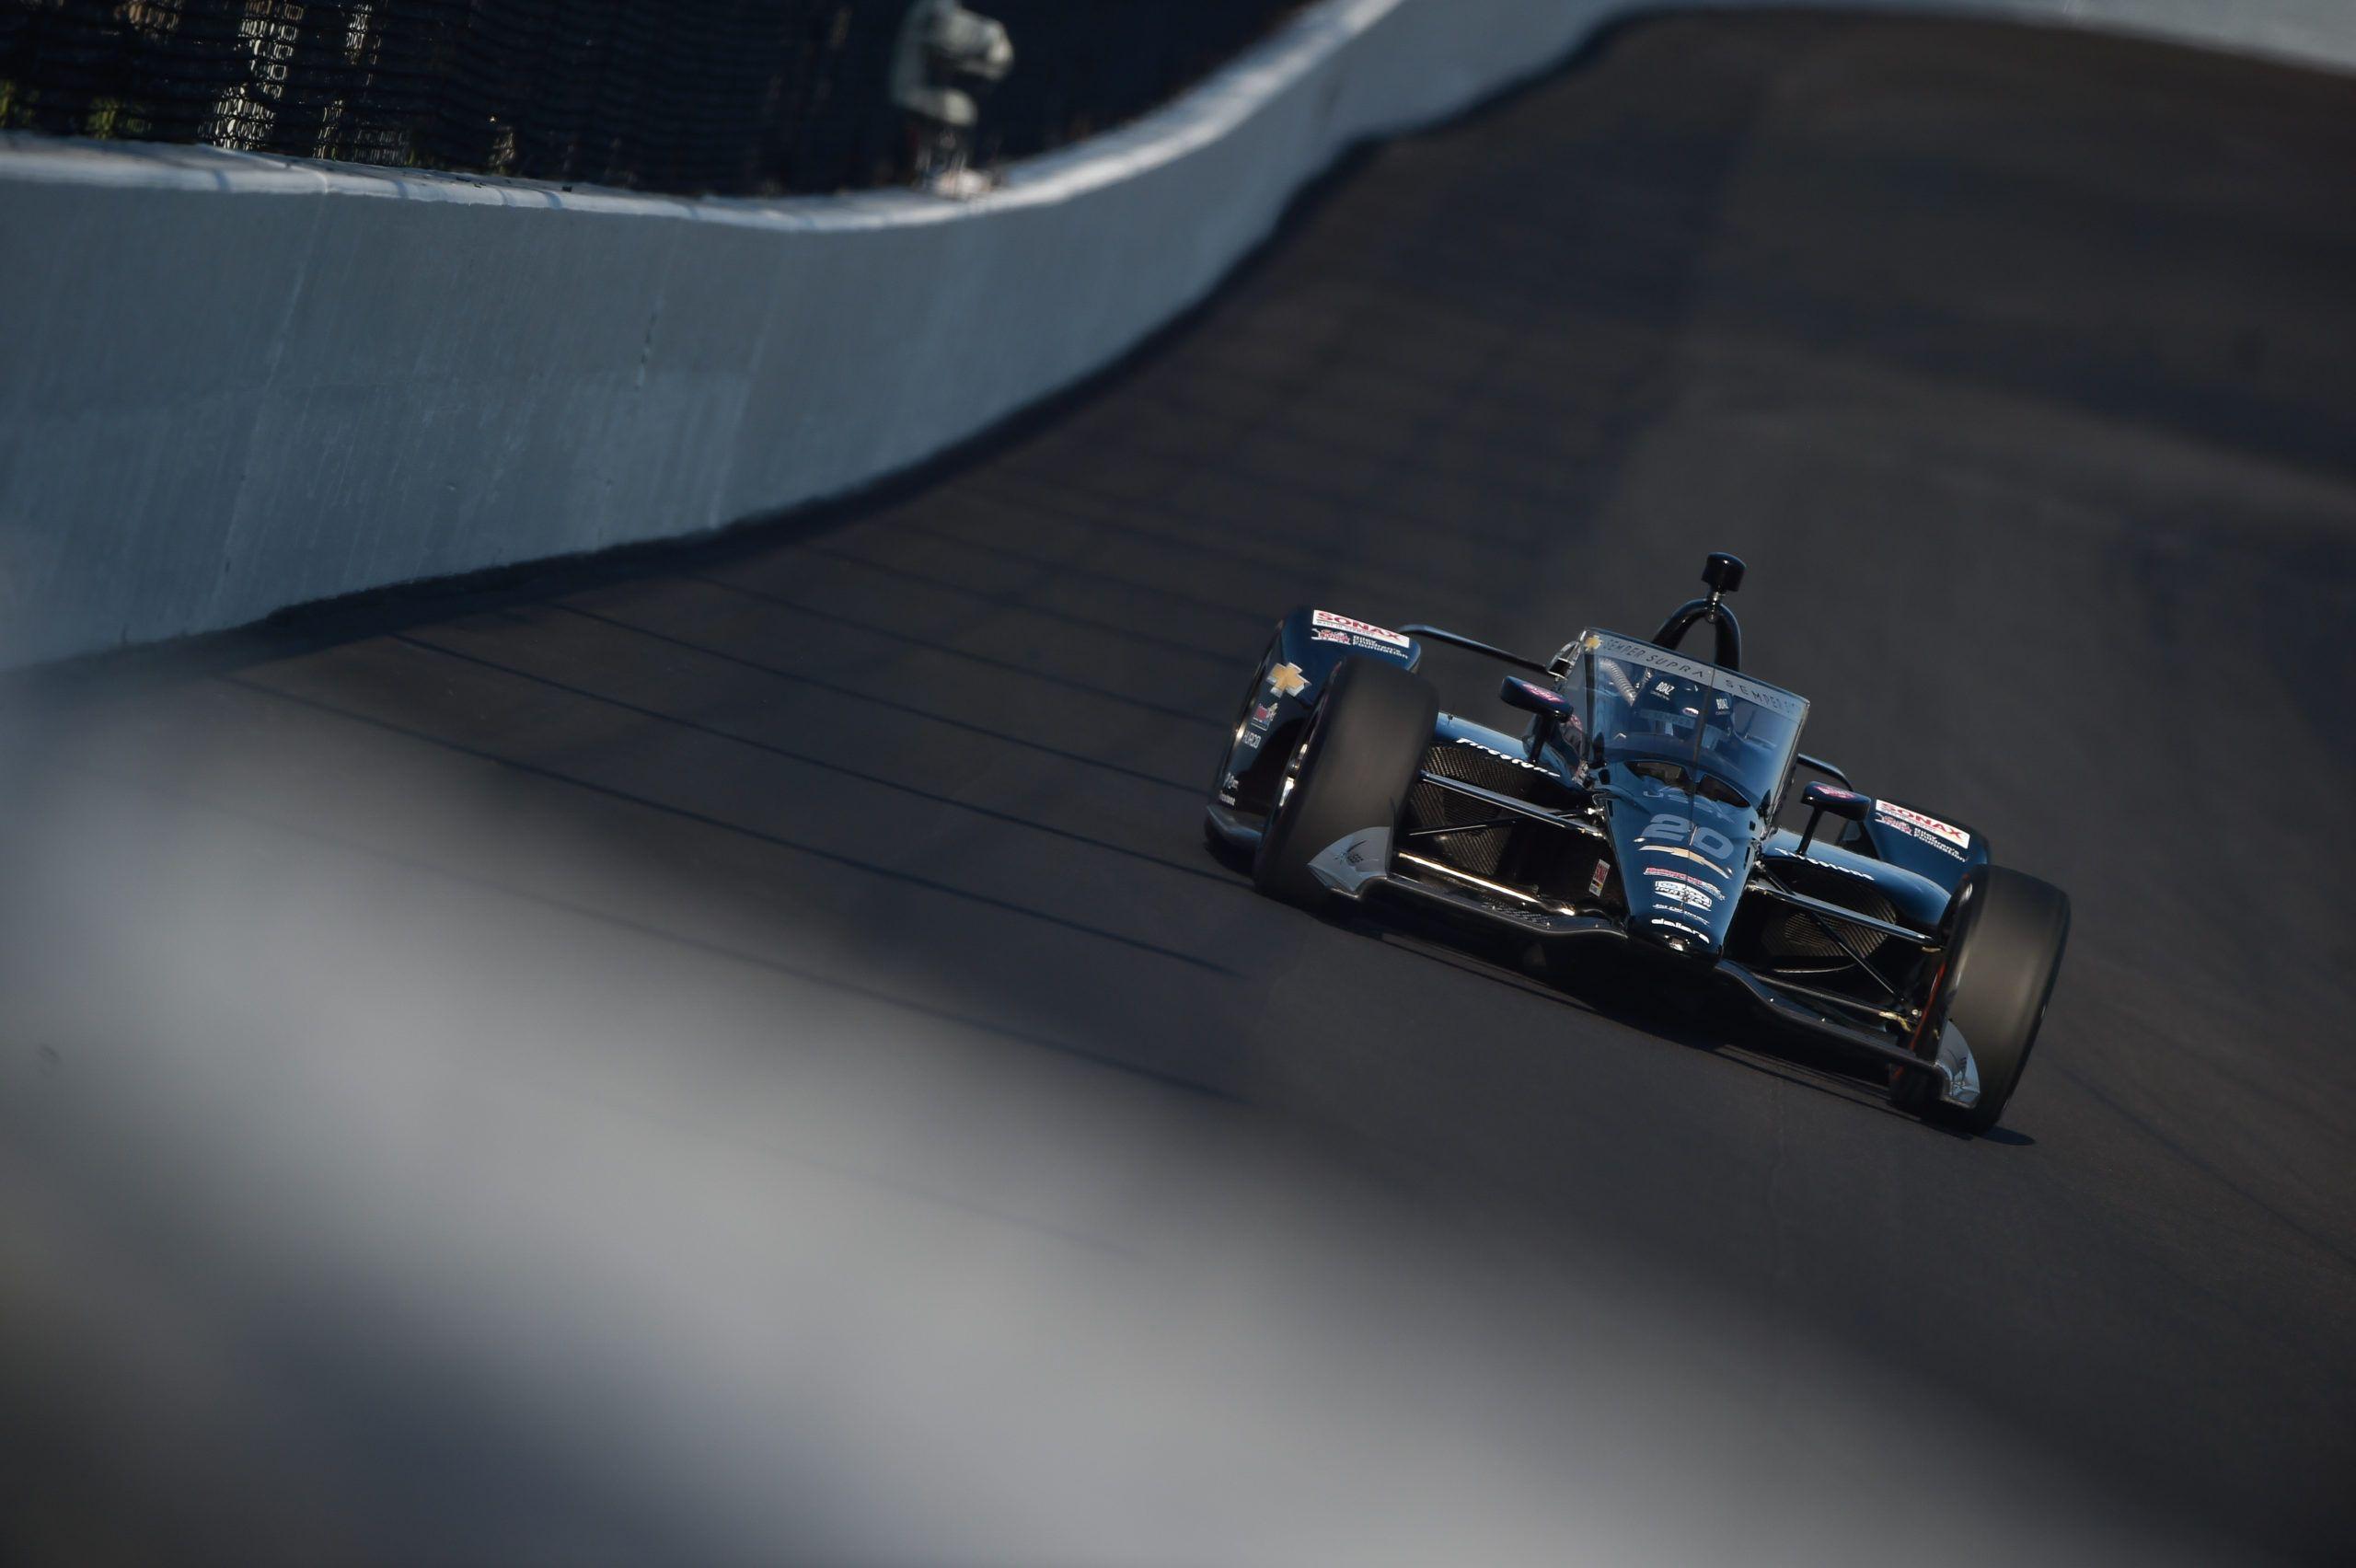 Ed Carpenter Racing, RInus Veekay, Meyer Shank Racing, Jack Harvey, Arrow McLaren SP, Patricio O'Ward, IndyCar, IndyCar 2021